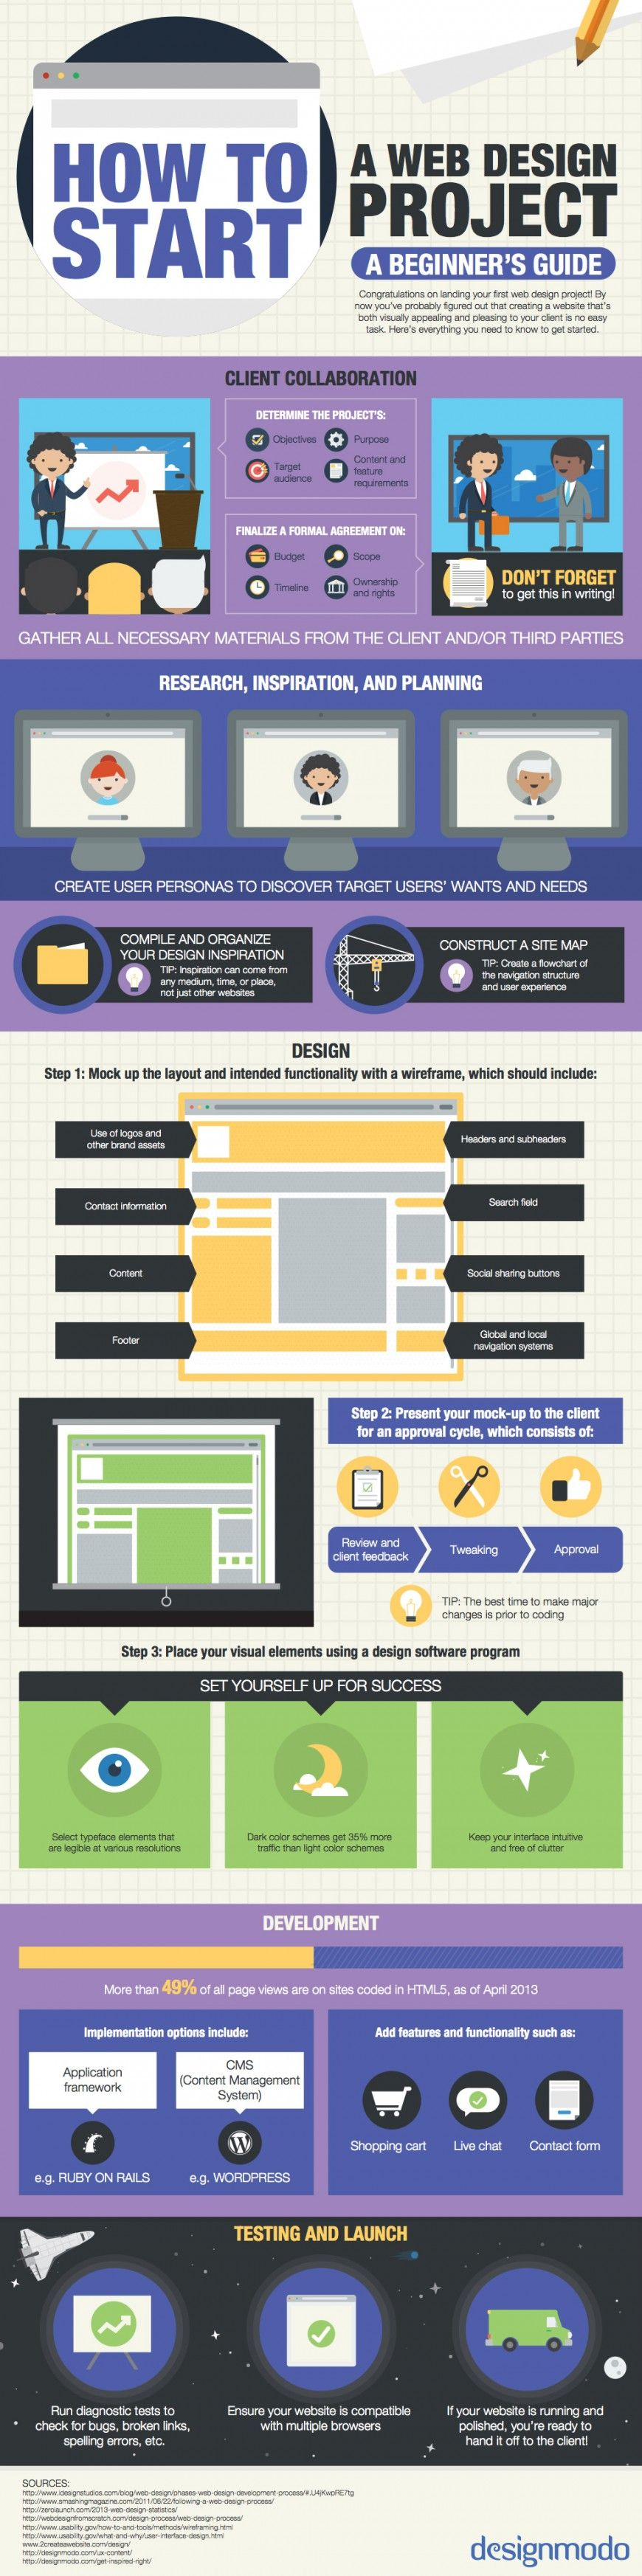 Graphic Design Inspiration Resources Freebies Ucreative Com Web Development Design Web Design Web Design Projects